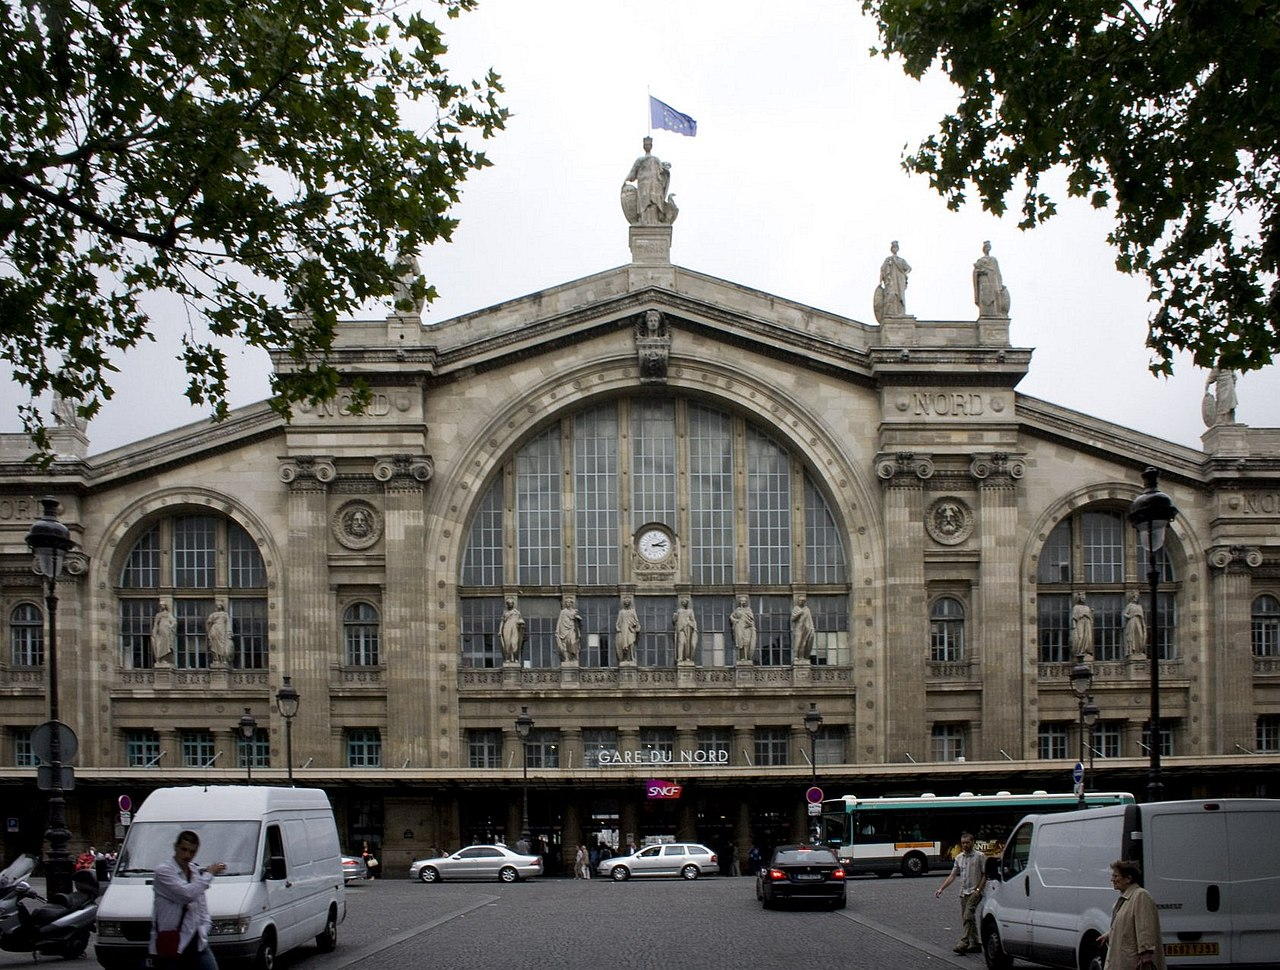 Paris 39 s gare du nord to get major transformation travelgumbo for Gare du nord paris